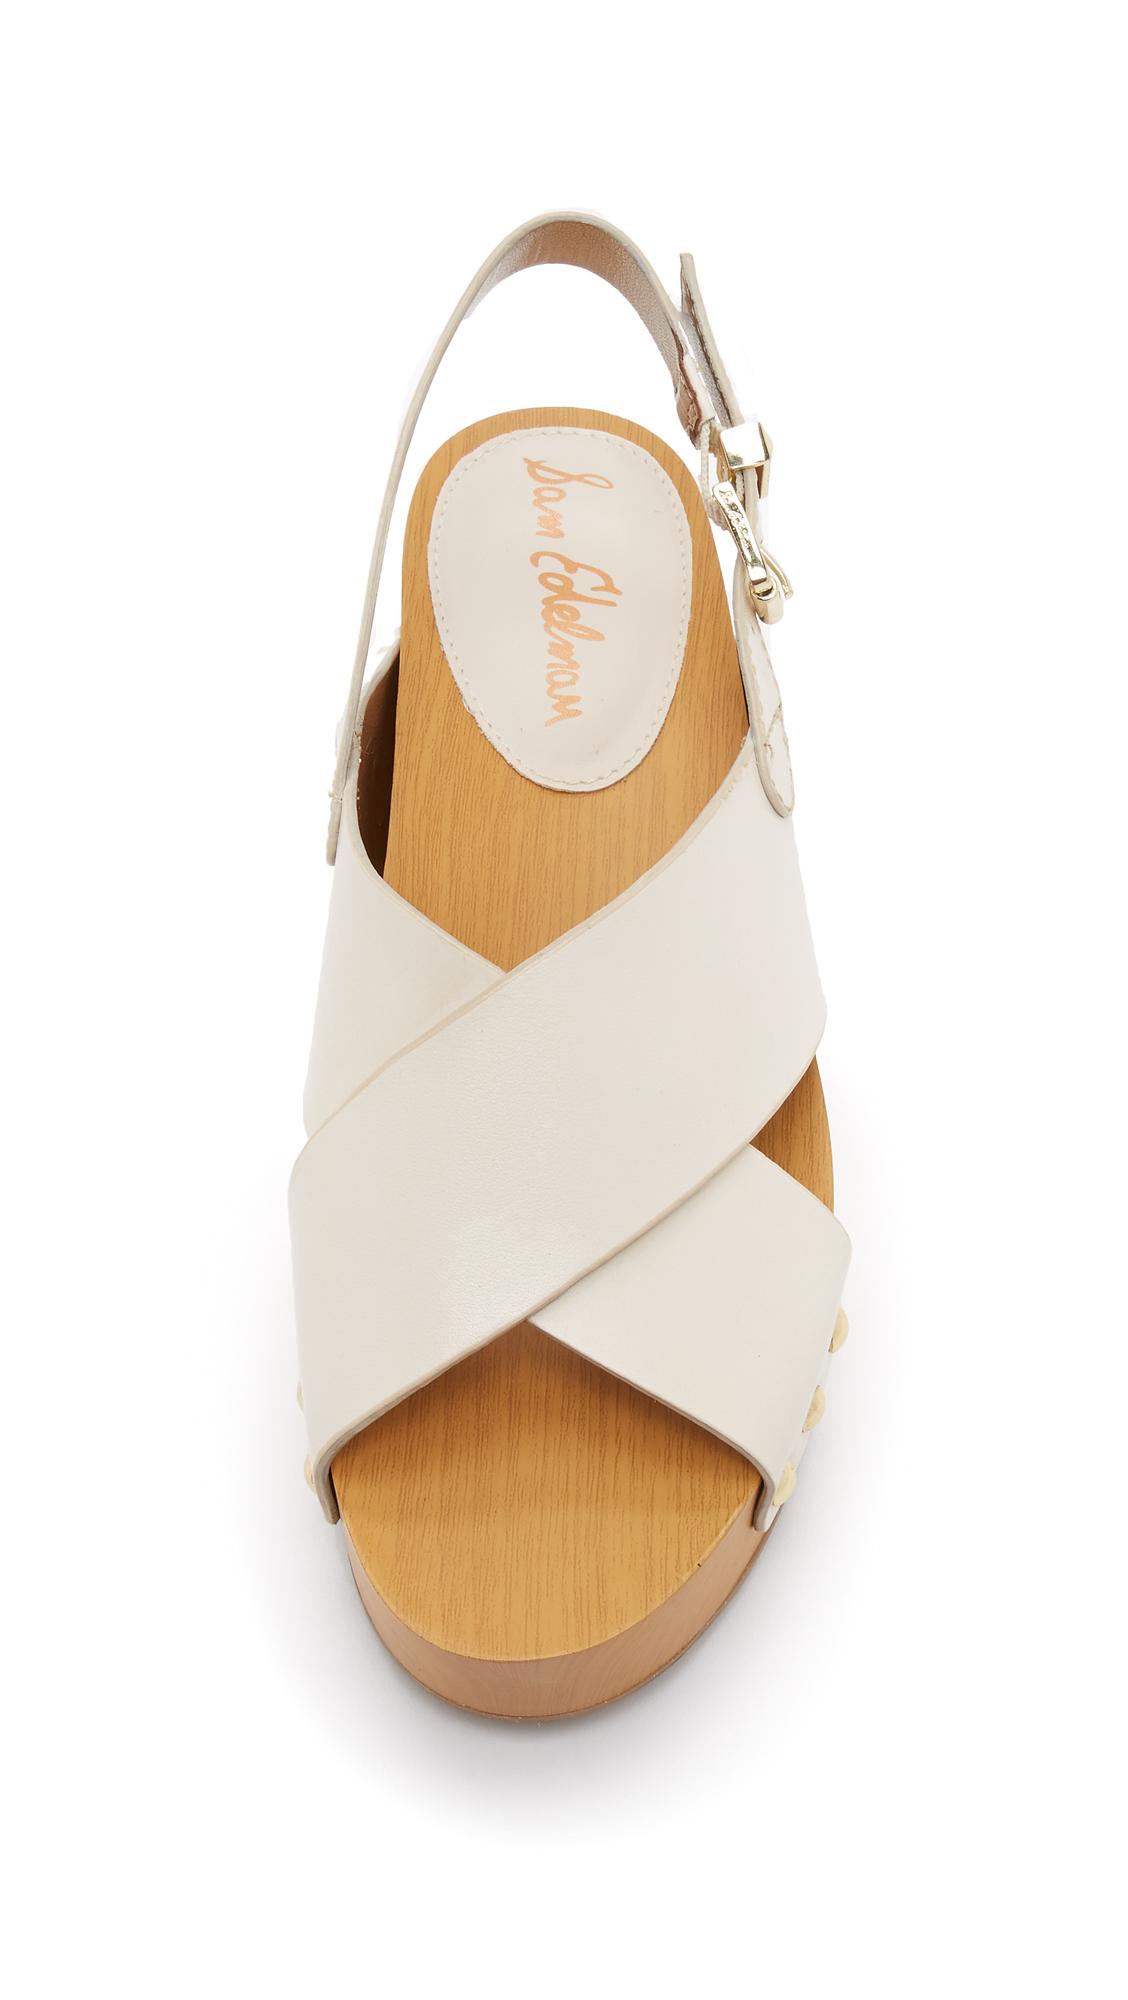 aae66657b Sam Edelman Bentlee Flatform Sandals